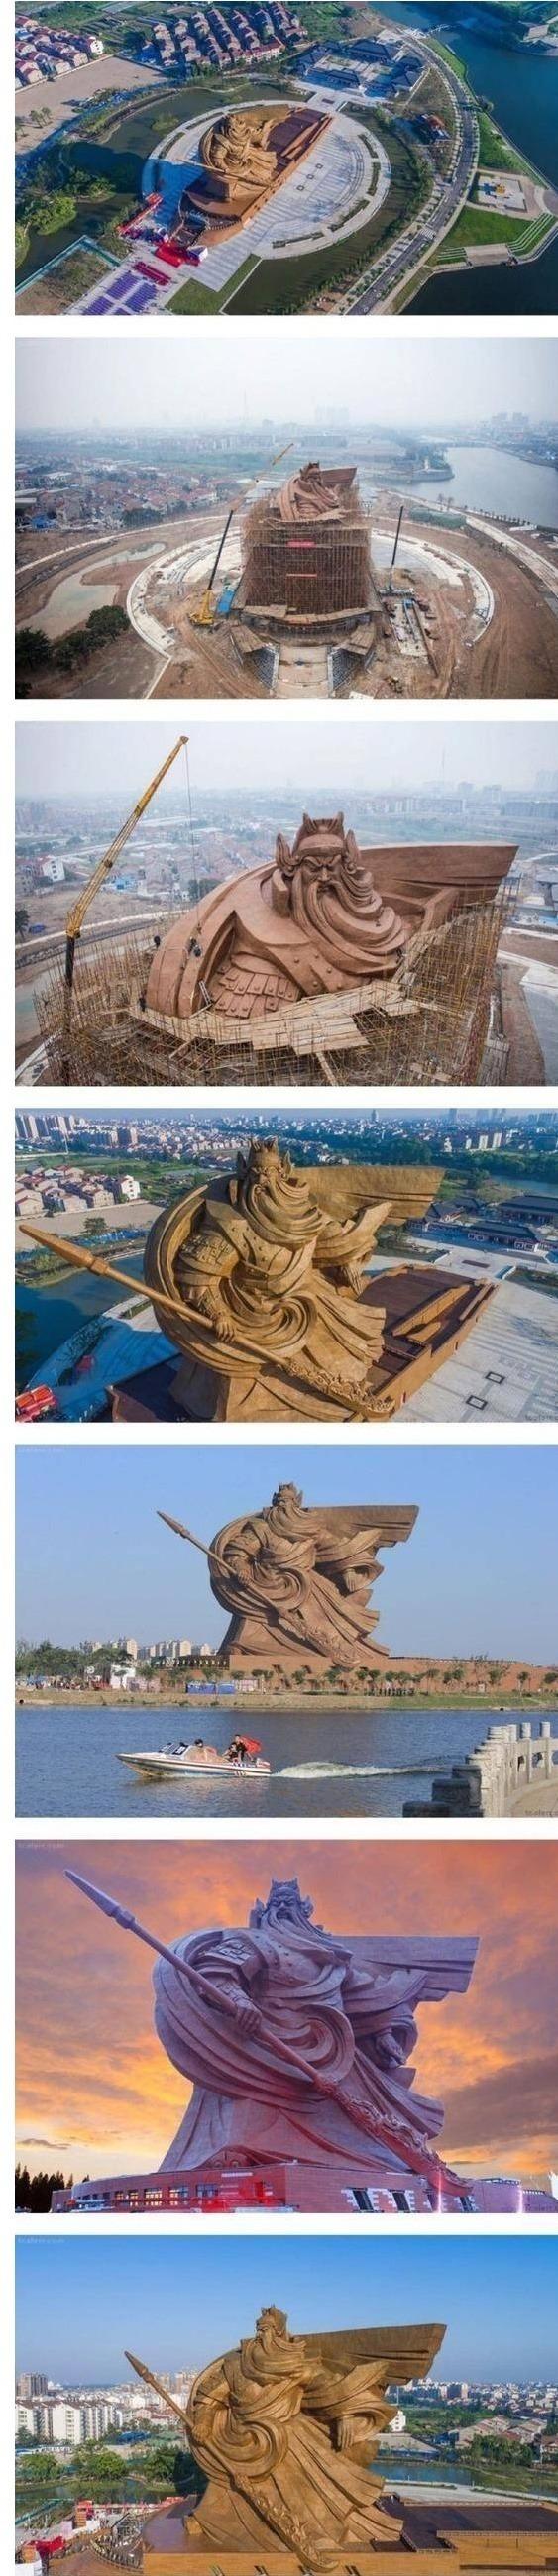 Масштаб статуи в Китае масштаб, статуя, Китай, длиннопост